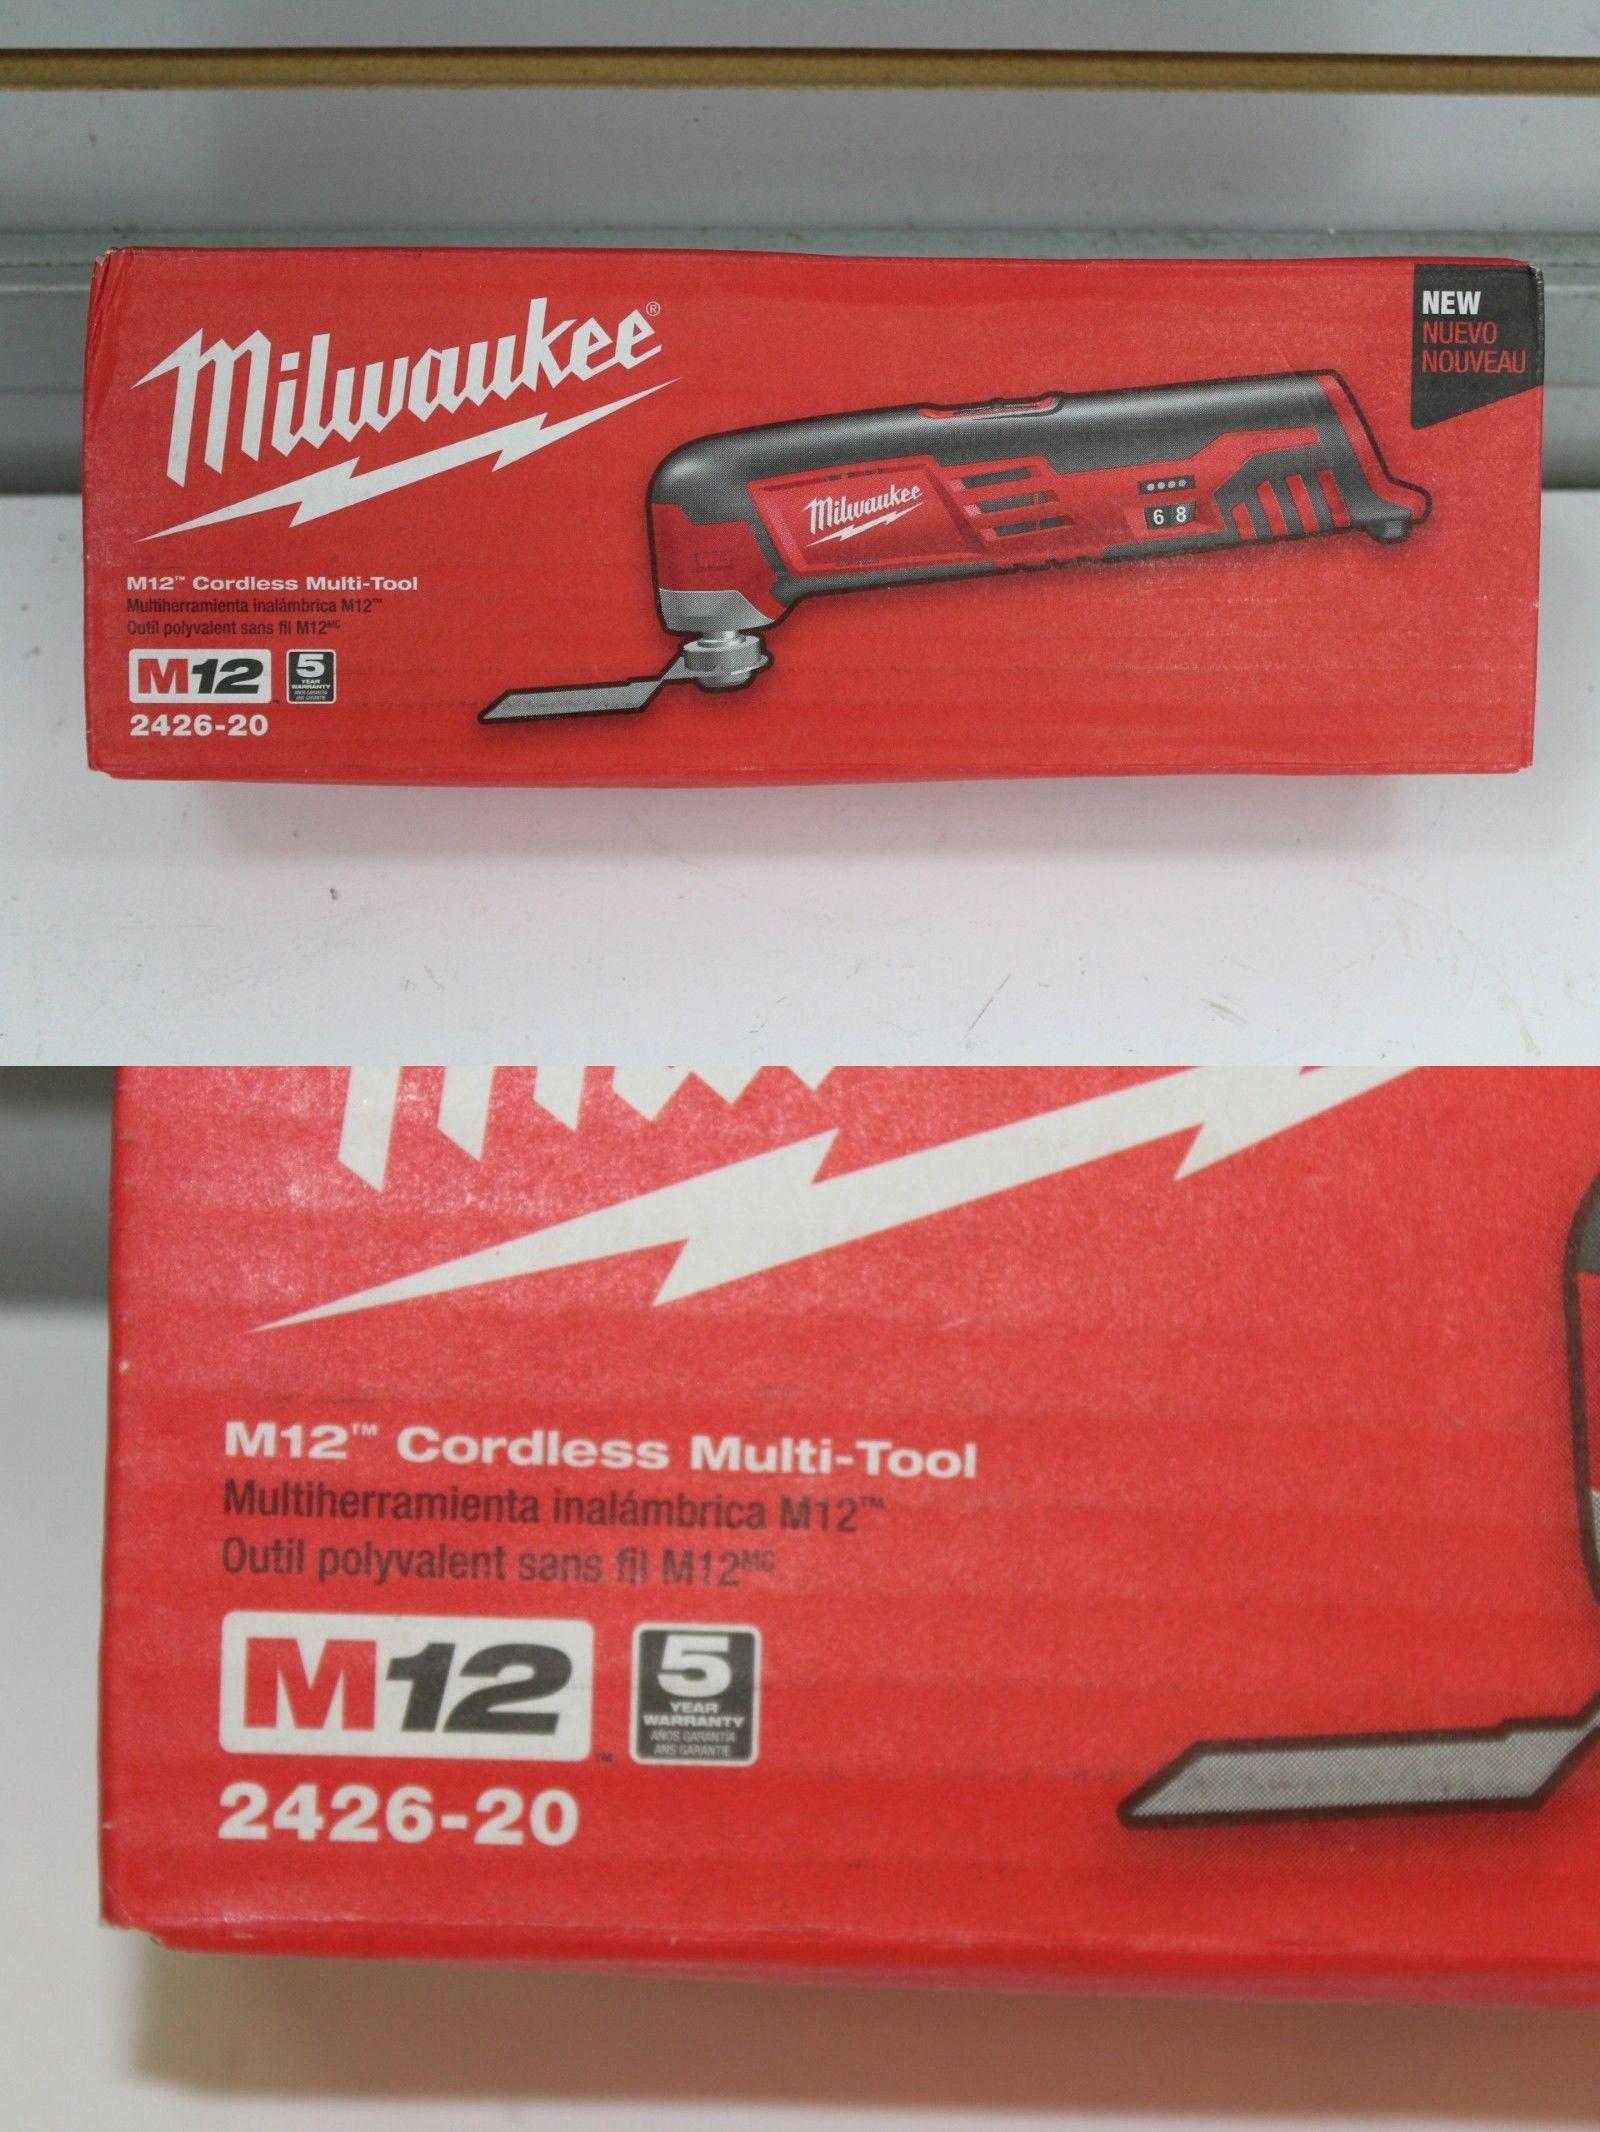 MILWAUKEE 2426-20 NEW 12V Li-Ion M12 Multi Oscillating Tool With Accessories